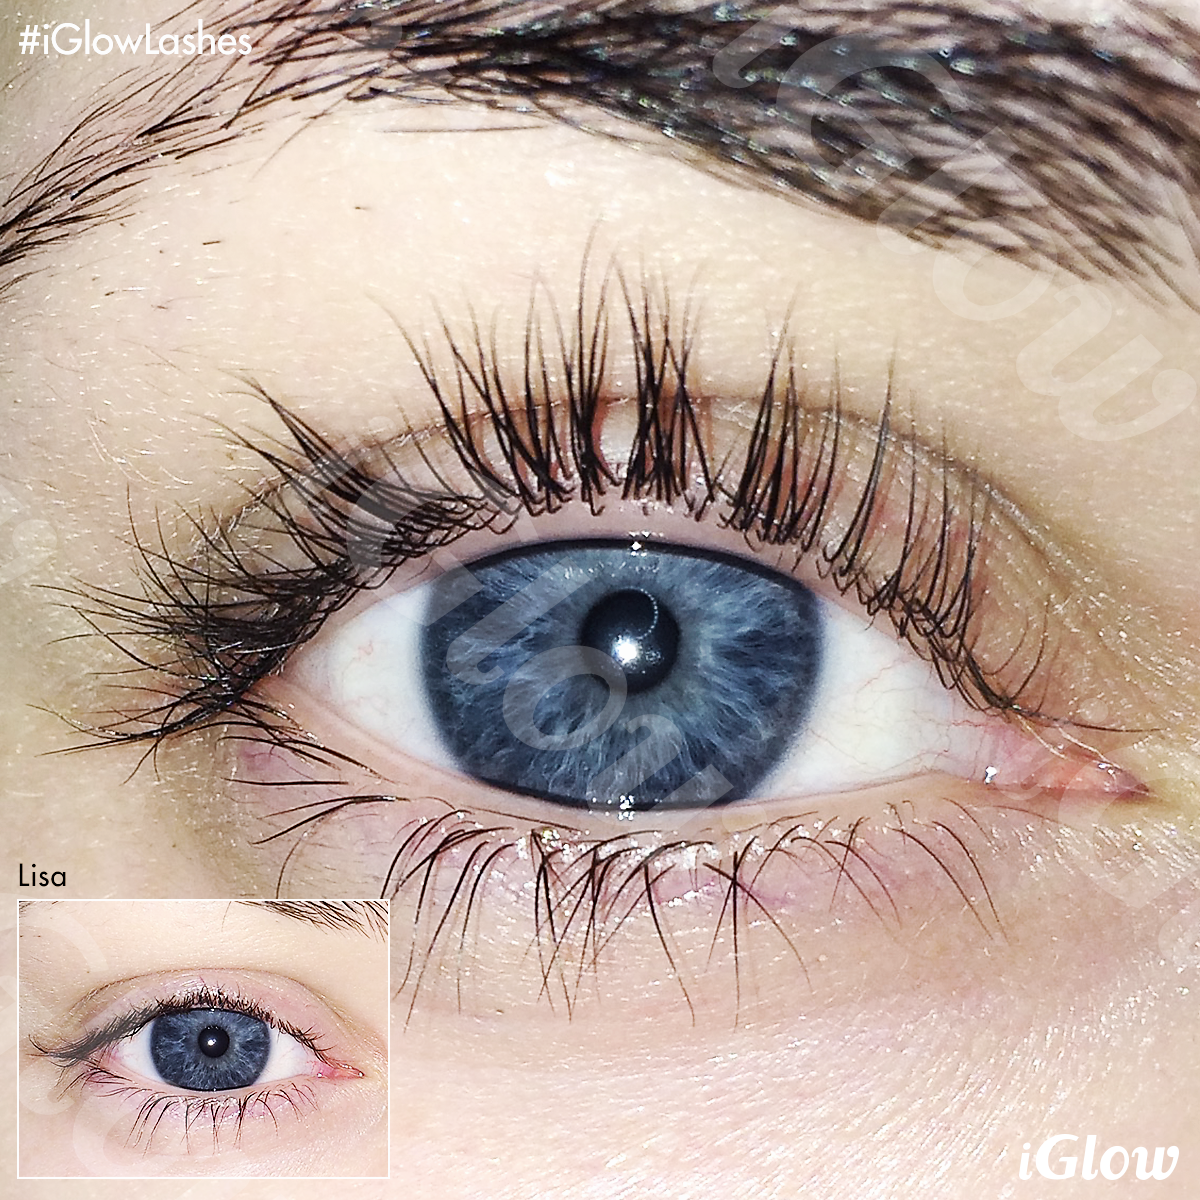 c1cdfcfb792 Long Lashes Serum - Vippeserum | iGlow Long Lashes Serum | Long lashes,  Lashes og Serum